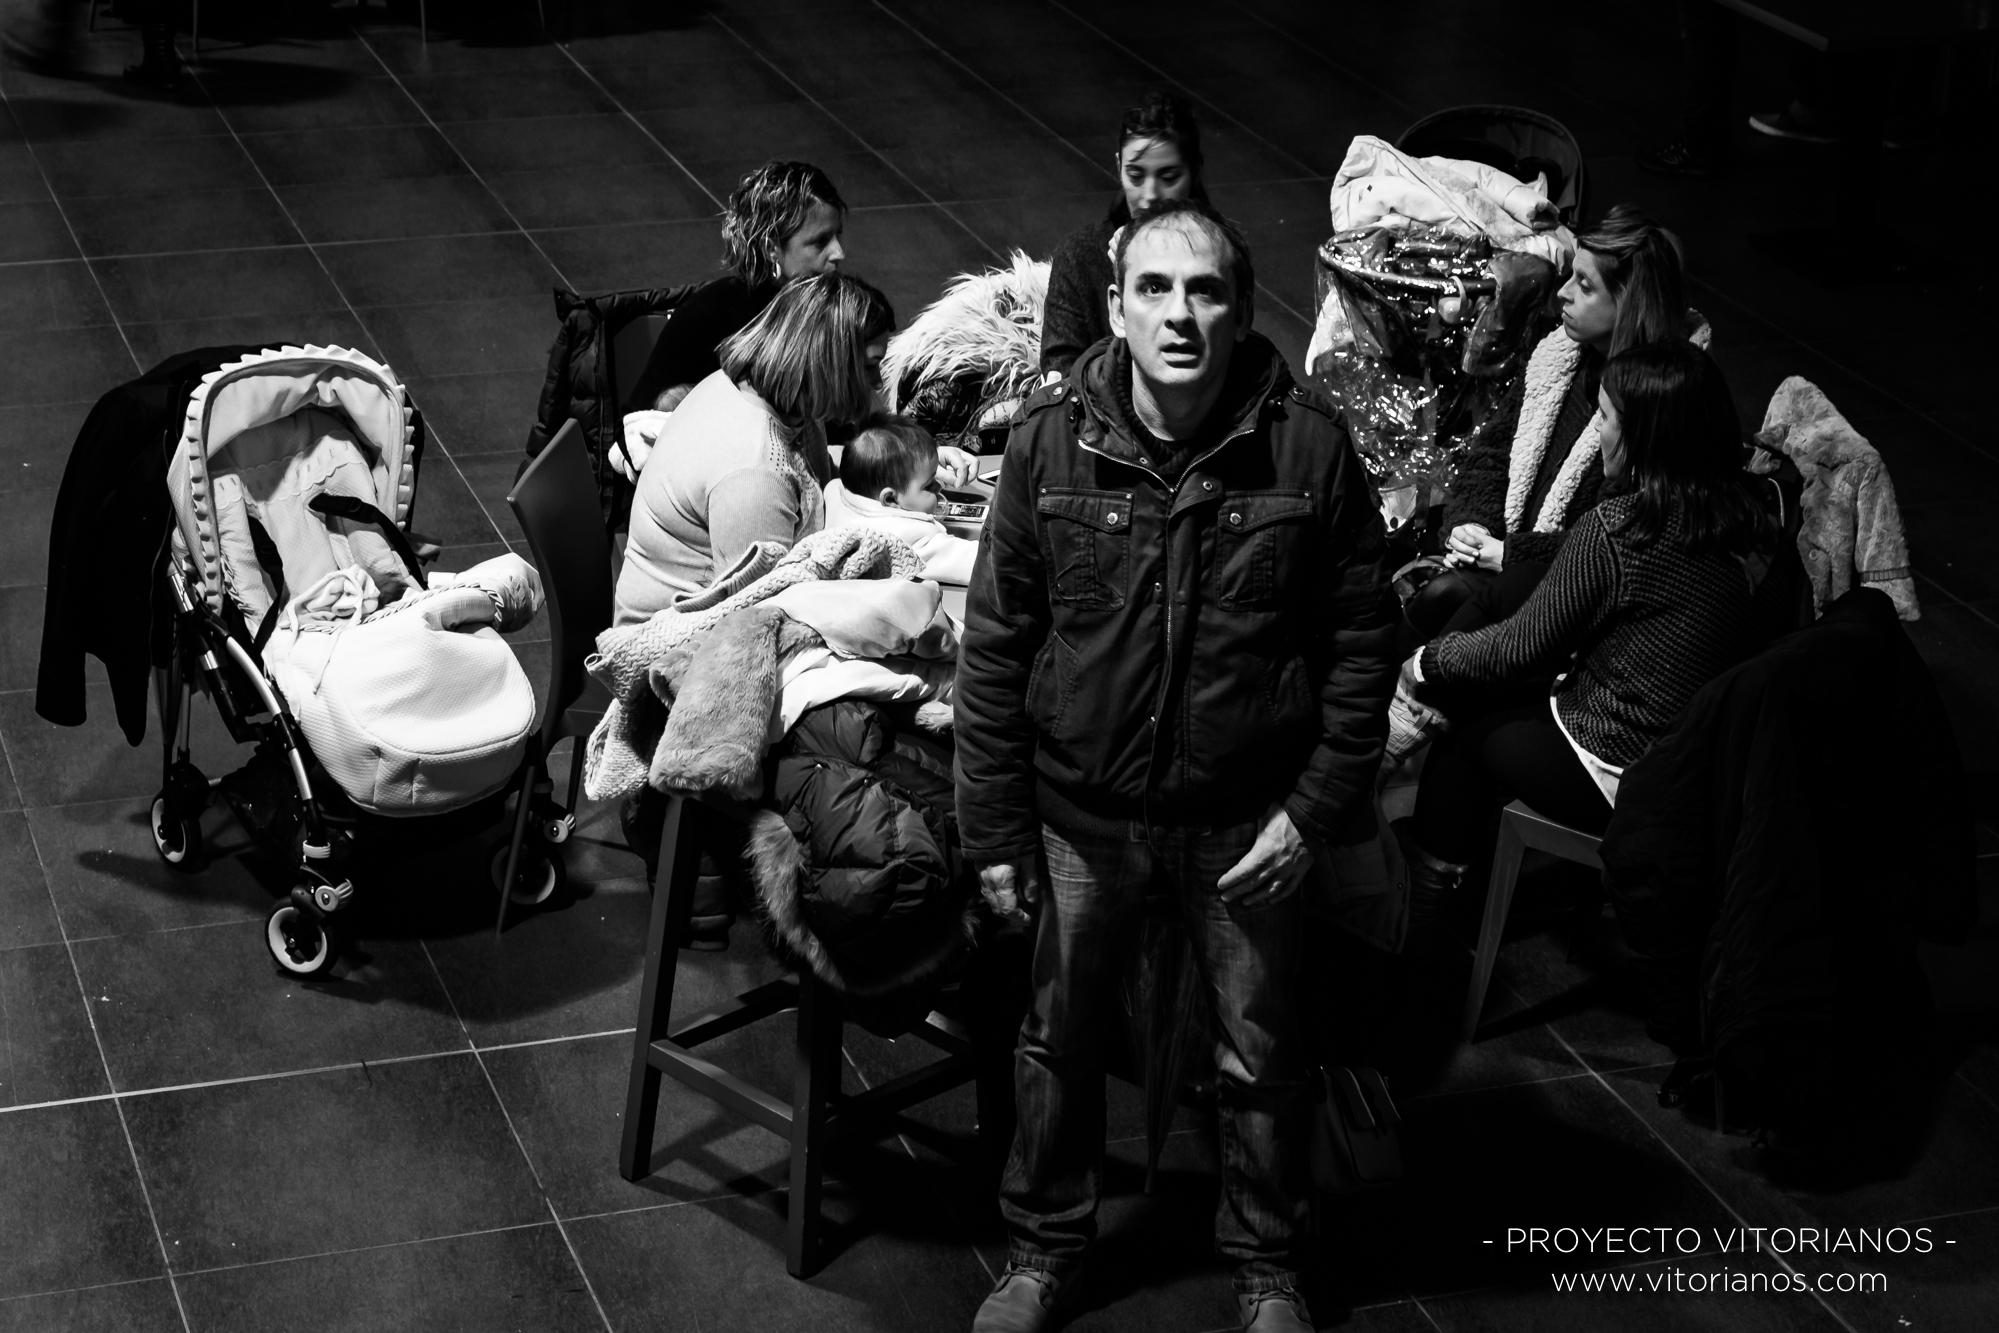 Vitoriano y vitorianas - Foto: Irune Bonilla